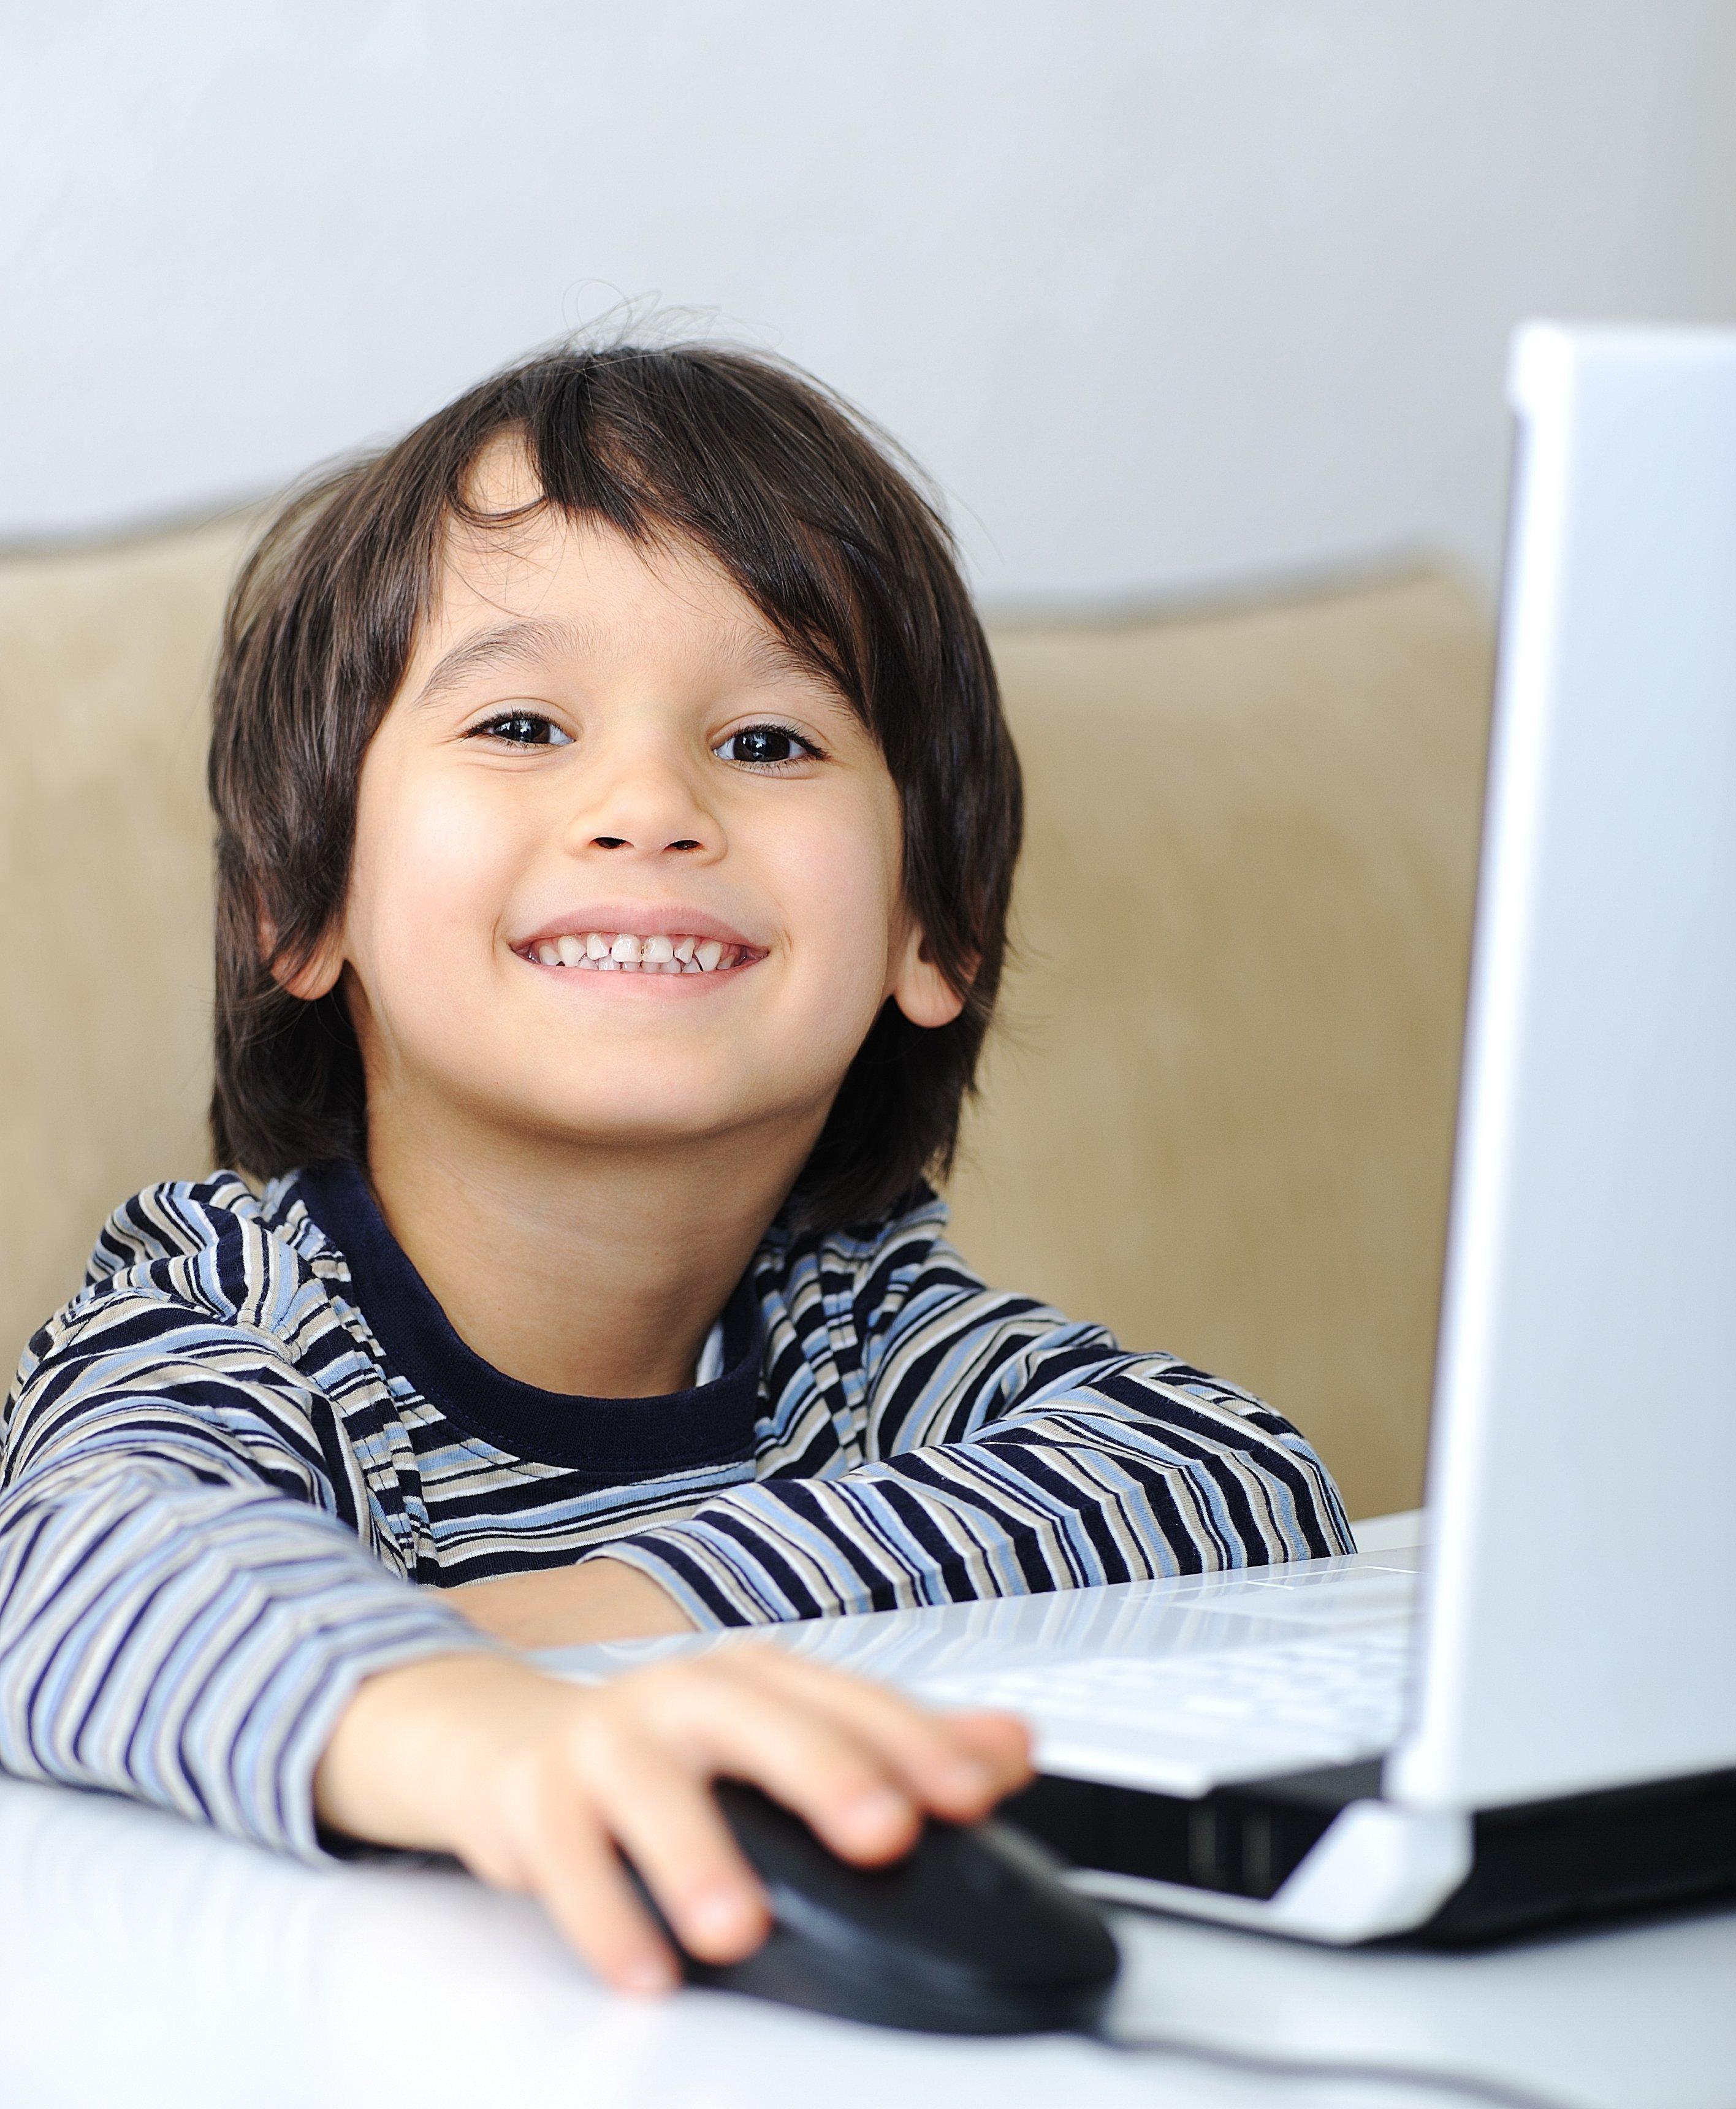 childhood-laptop-online-learning-math-reading-writing